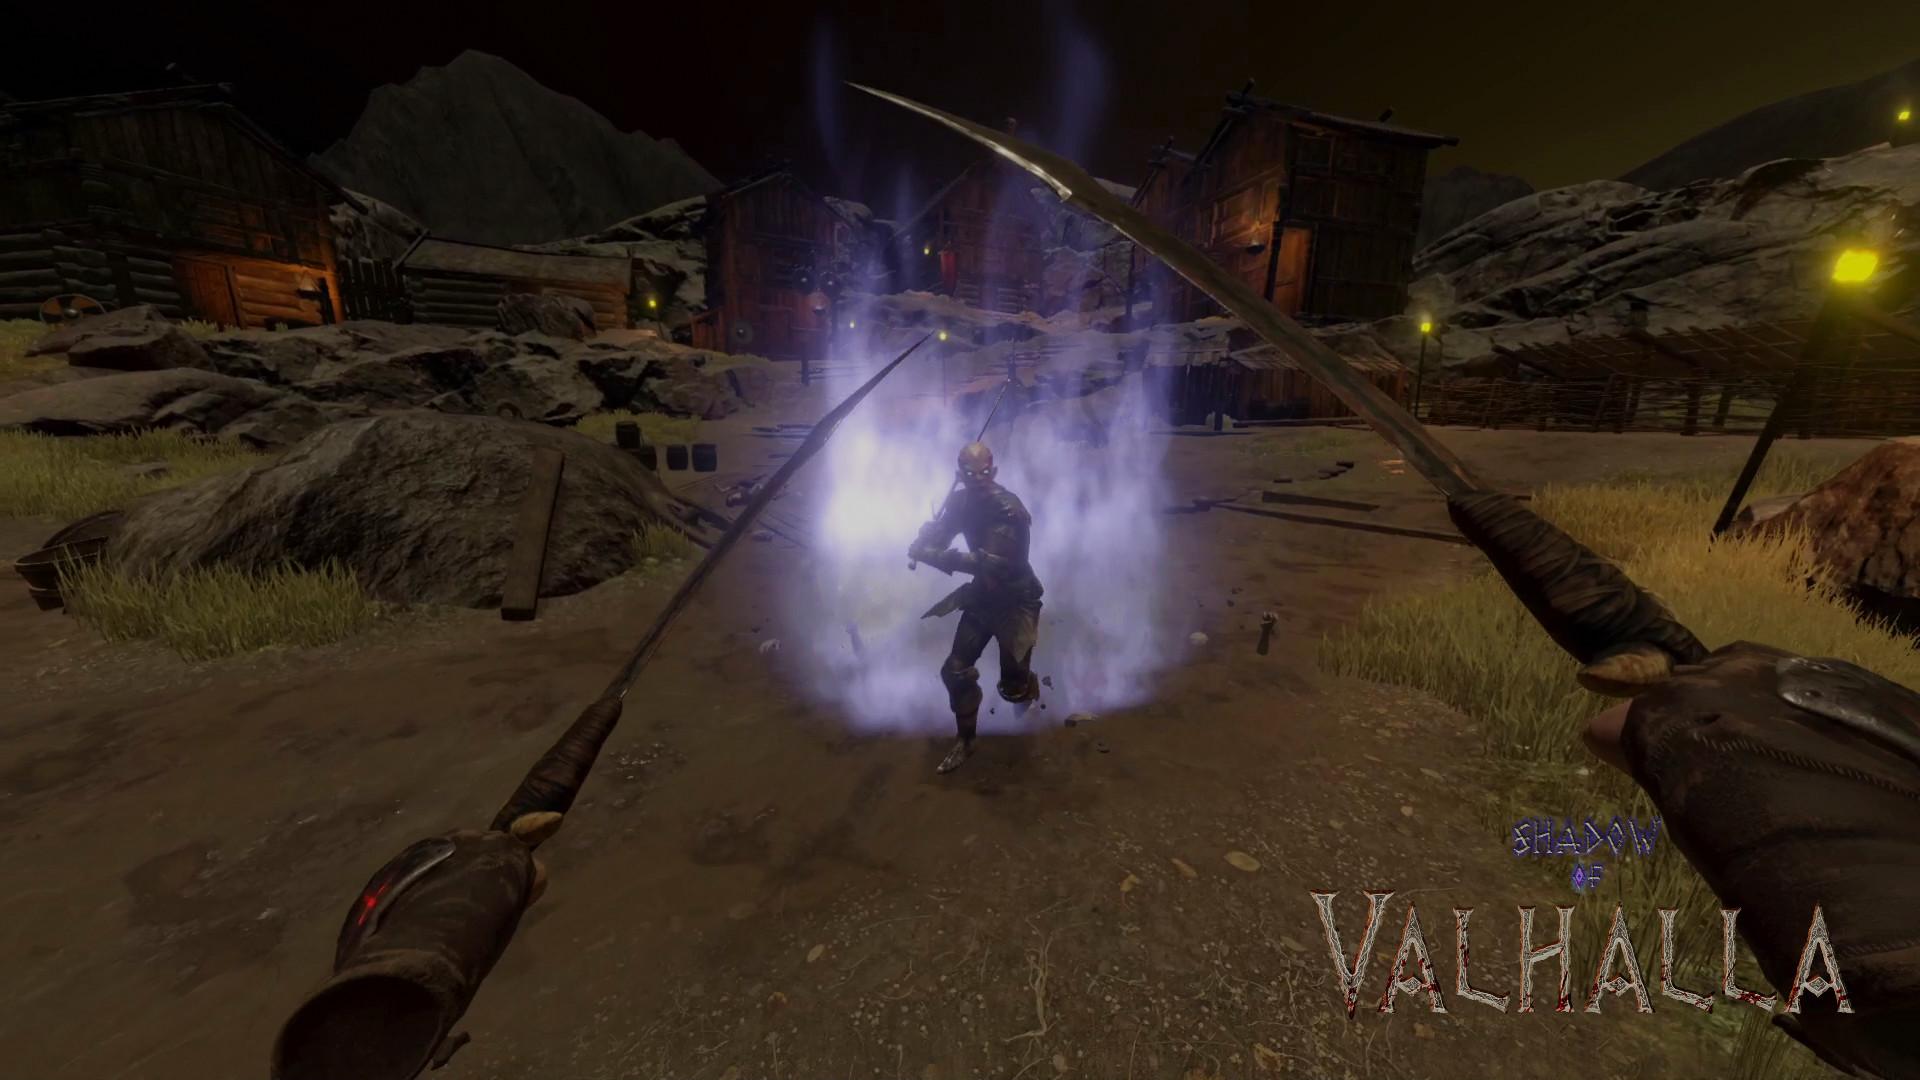 Shadow of Valhalla Free Download